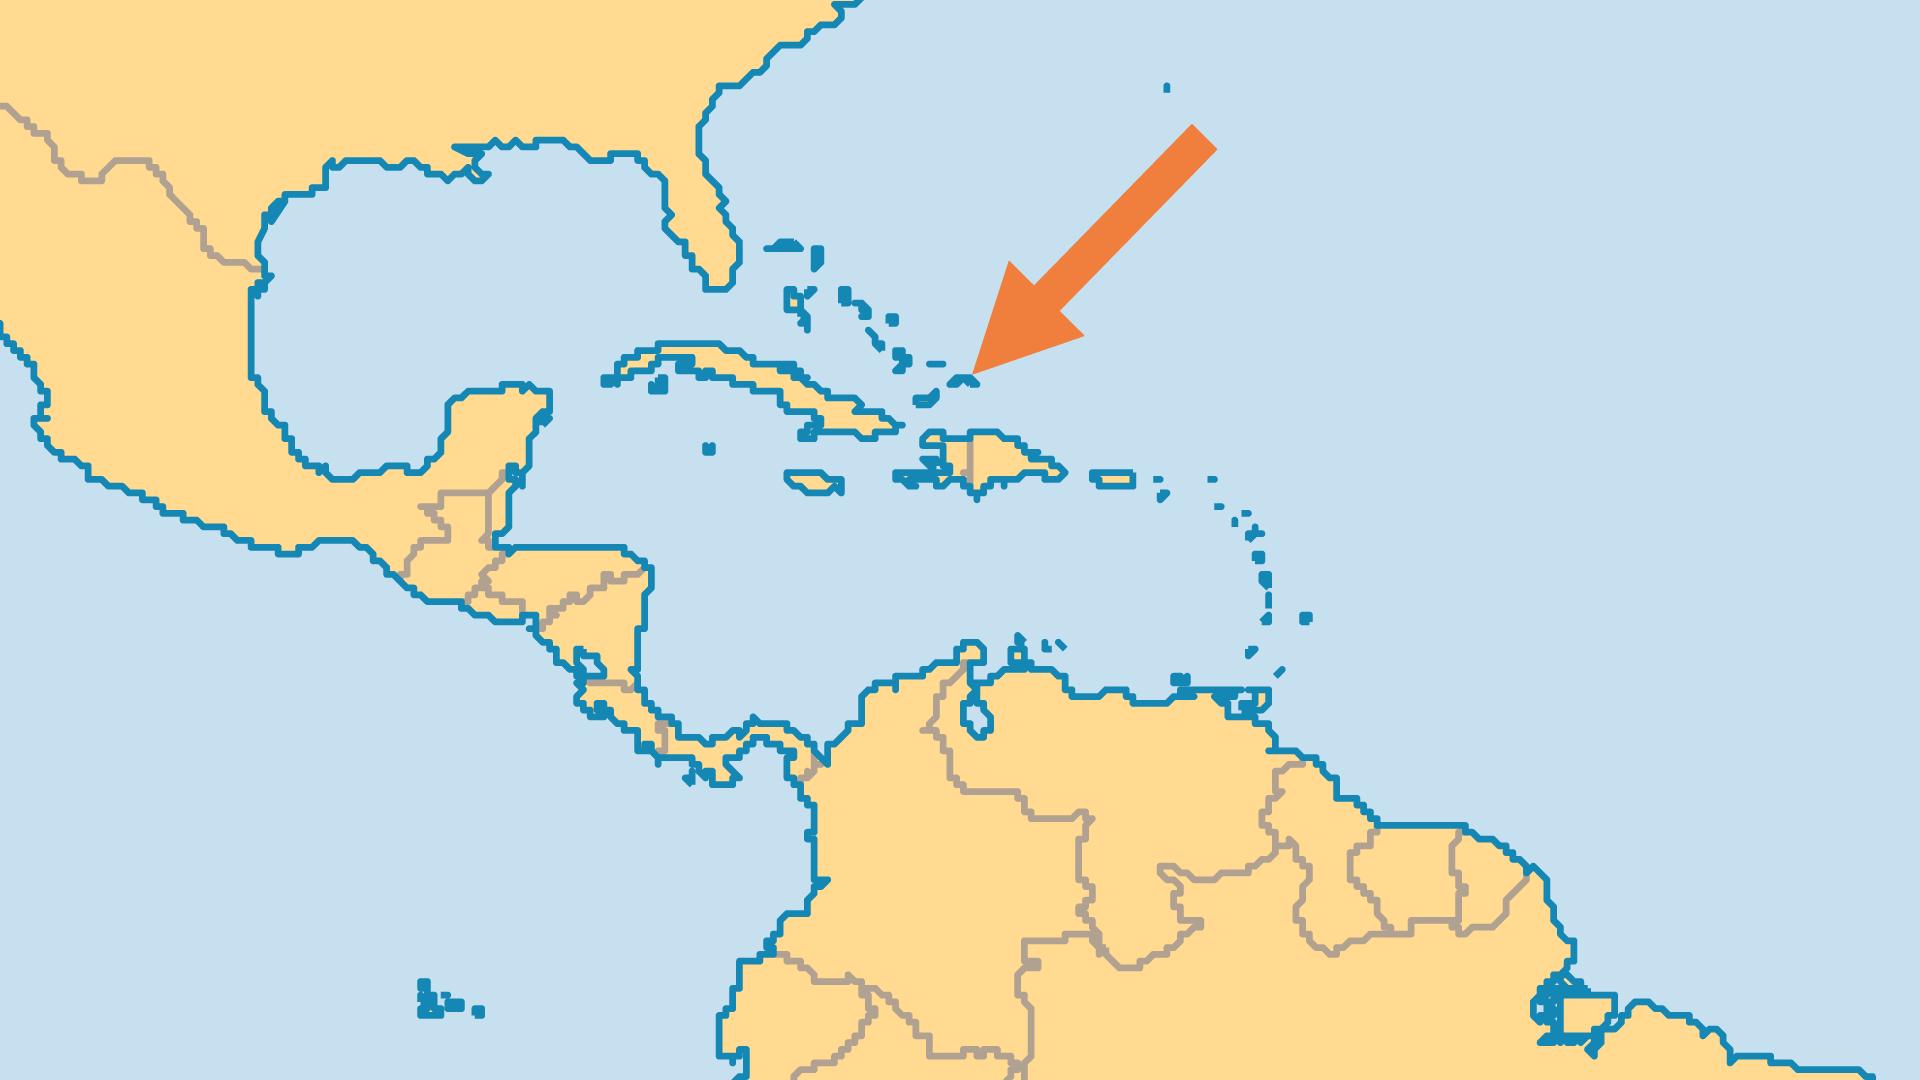 Locator Map for Turks & Caicos Islands